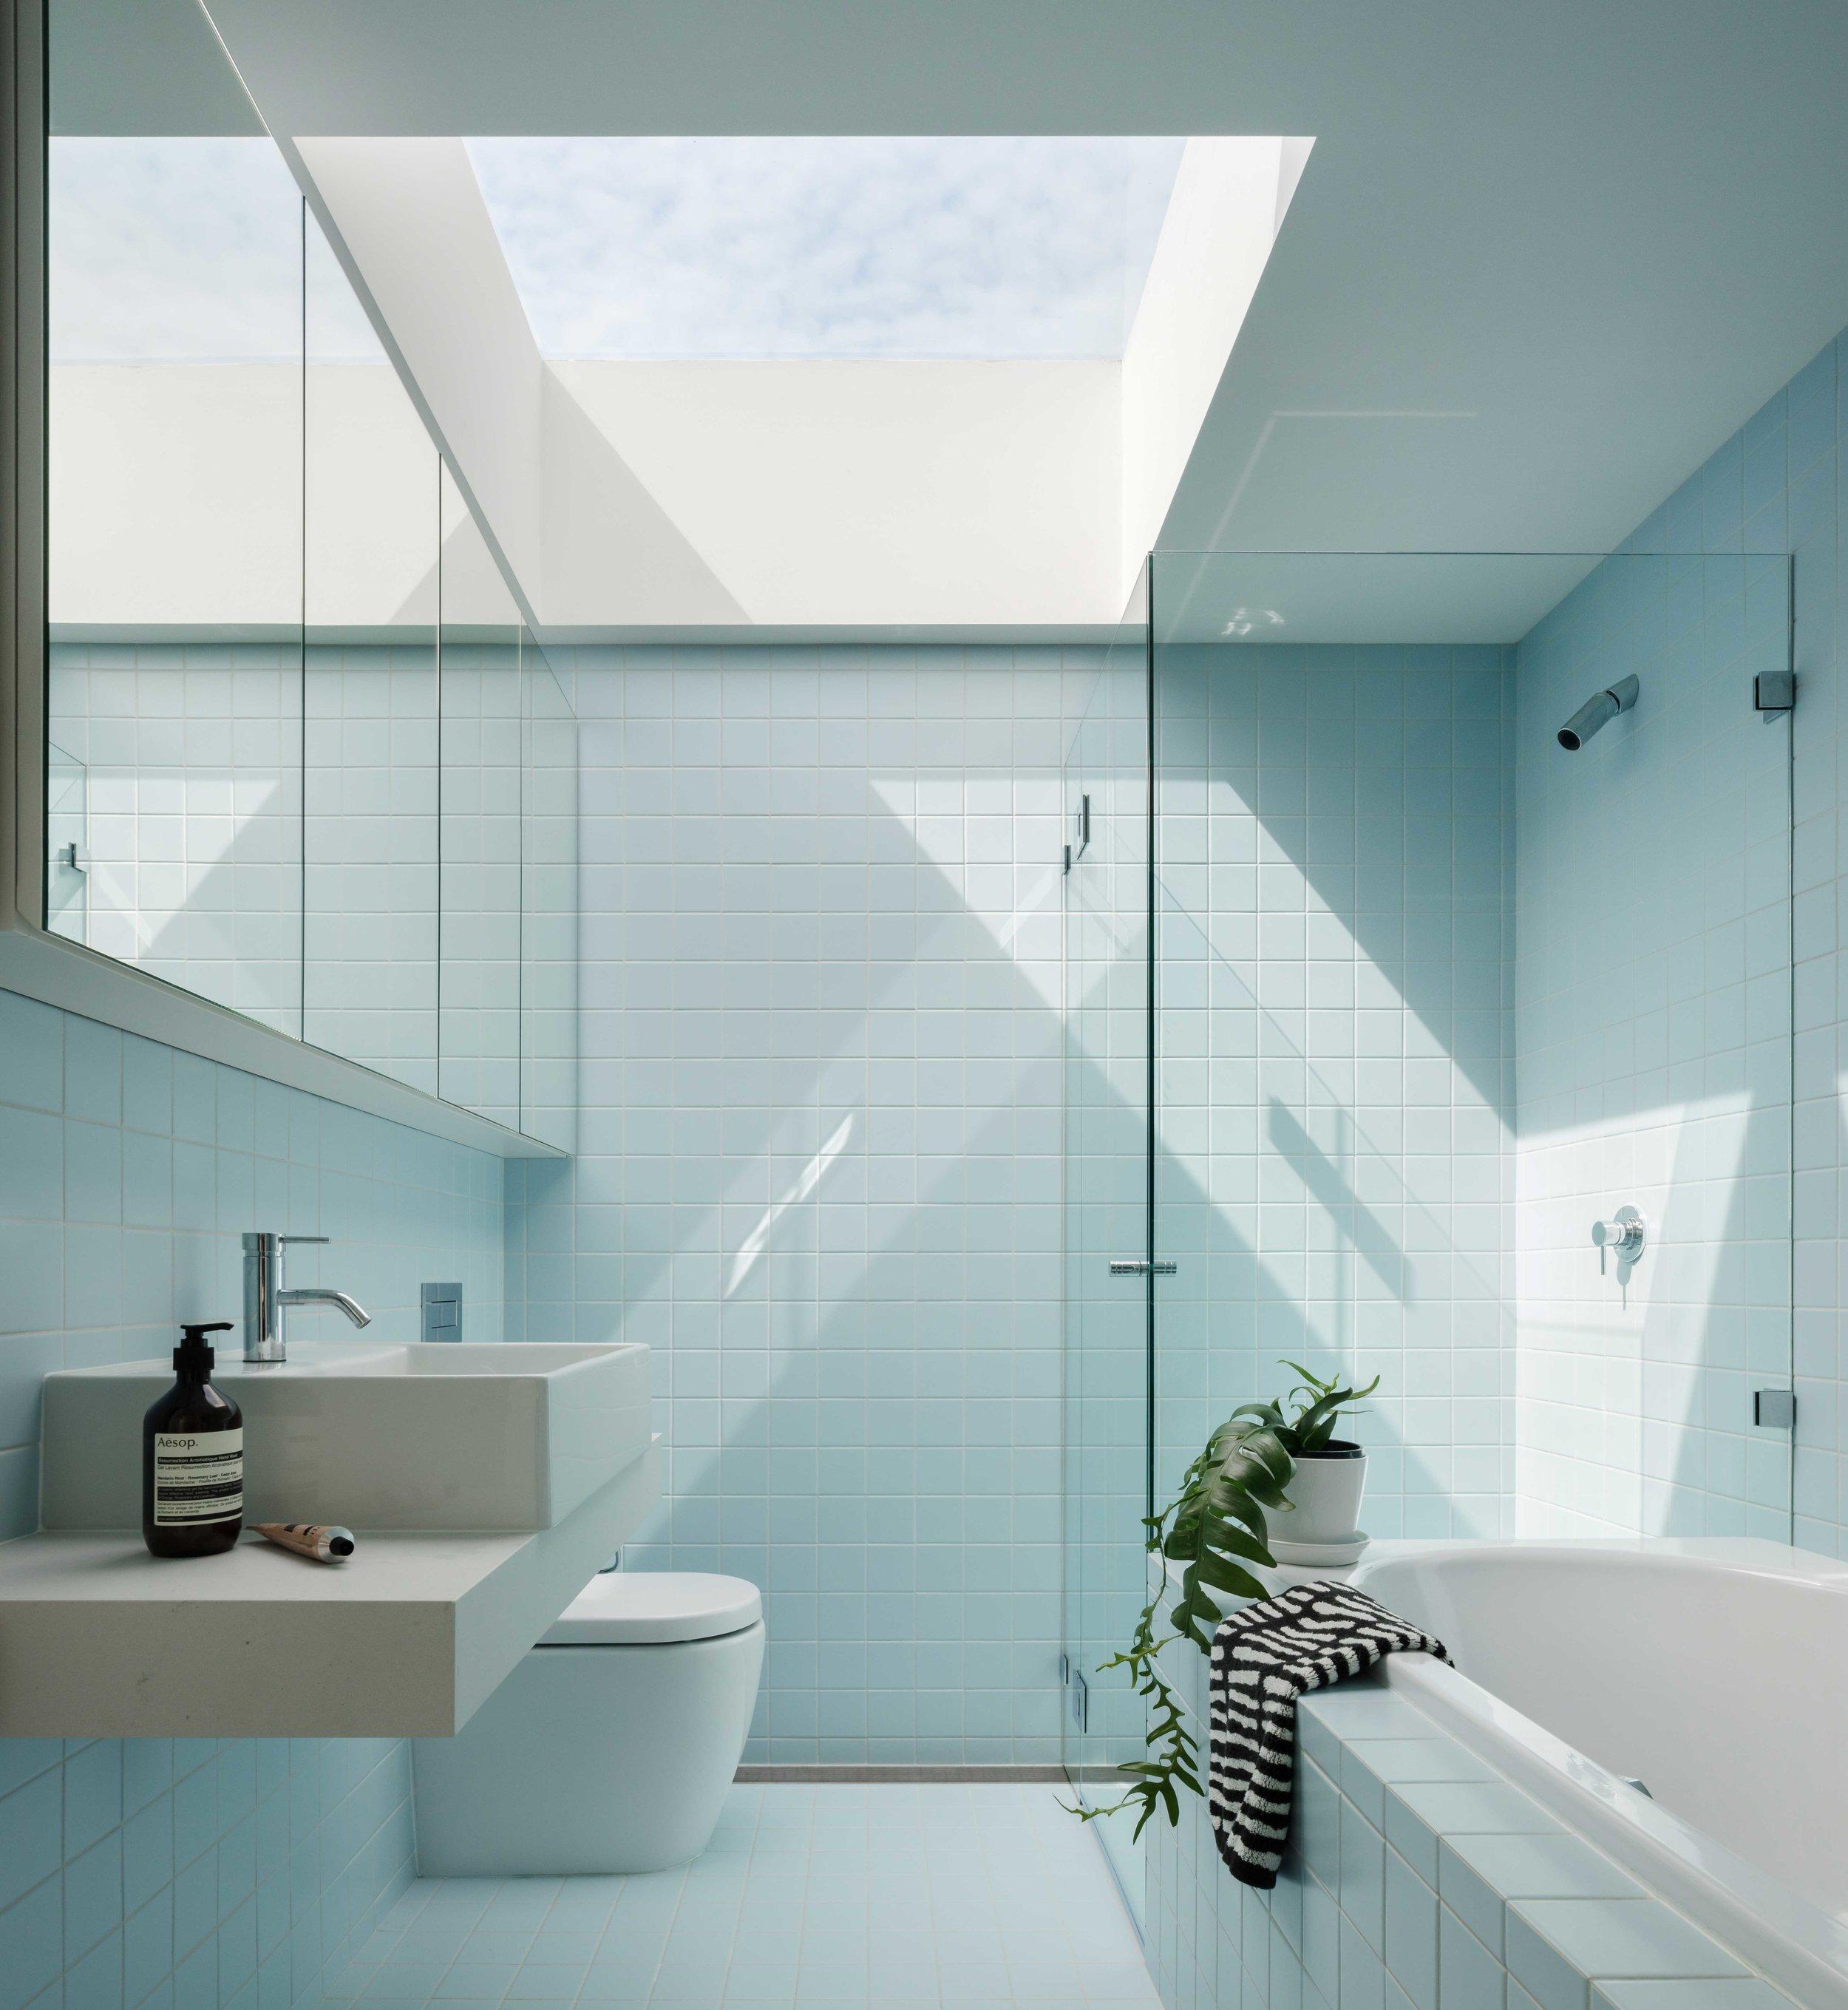 Surf-Box-04-©-Downie-North-Architects.jpg